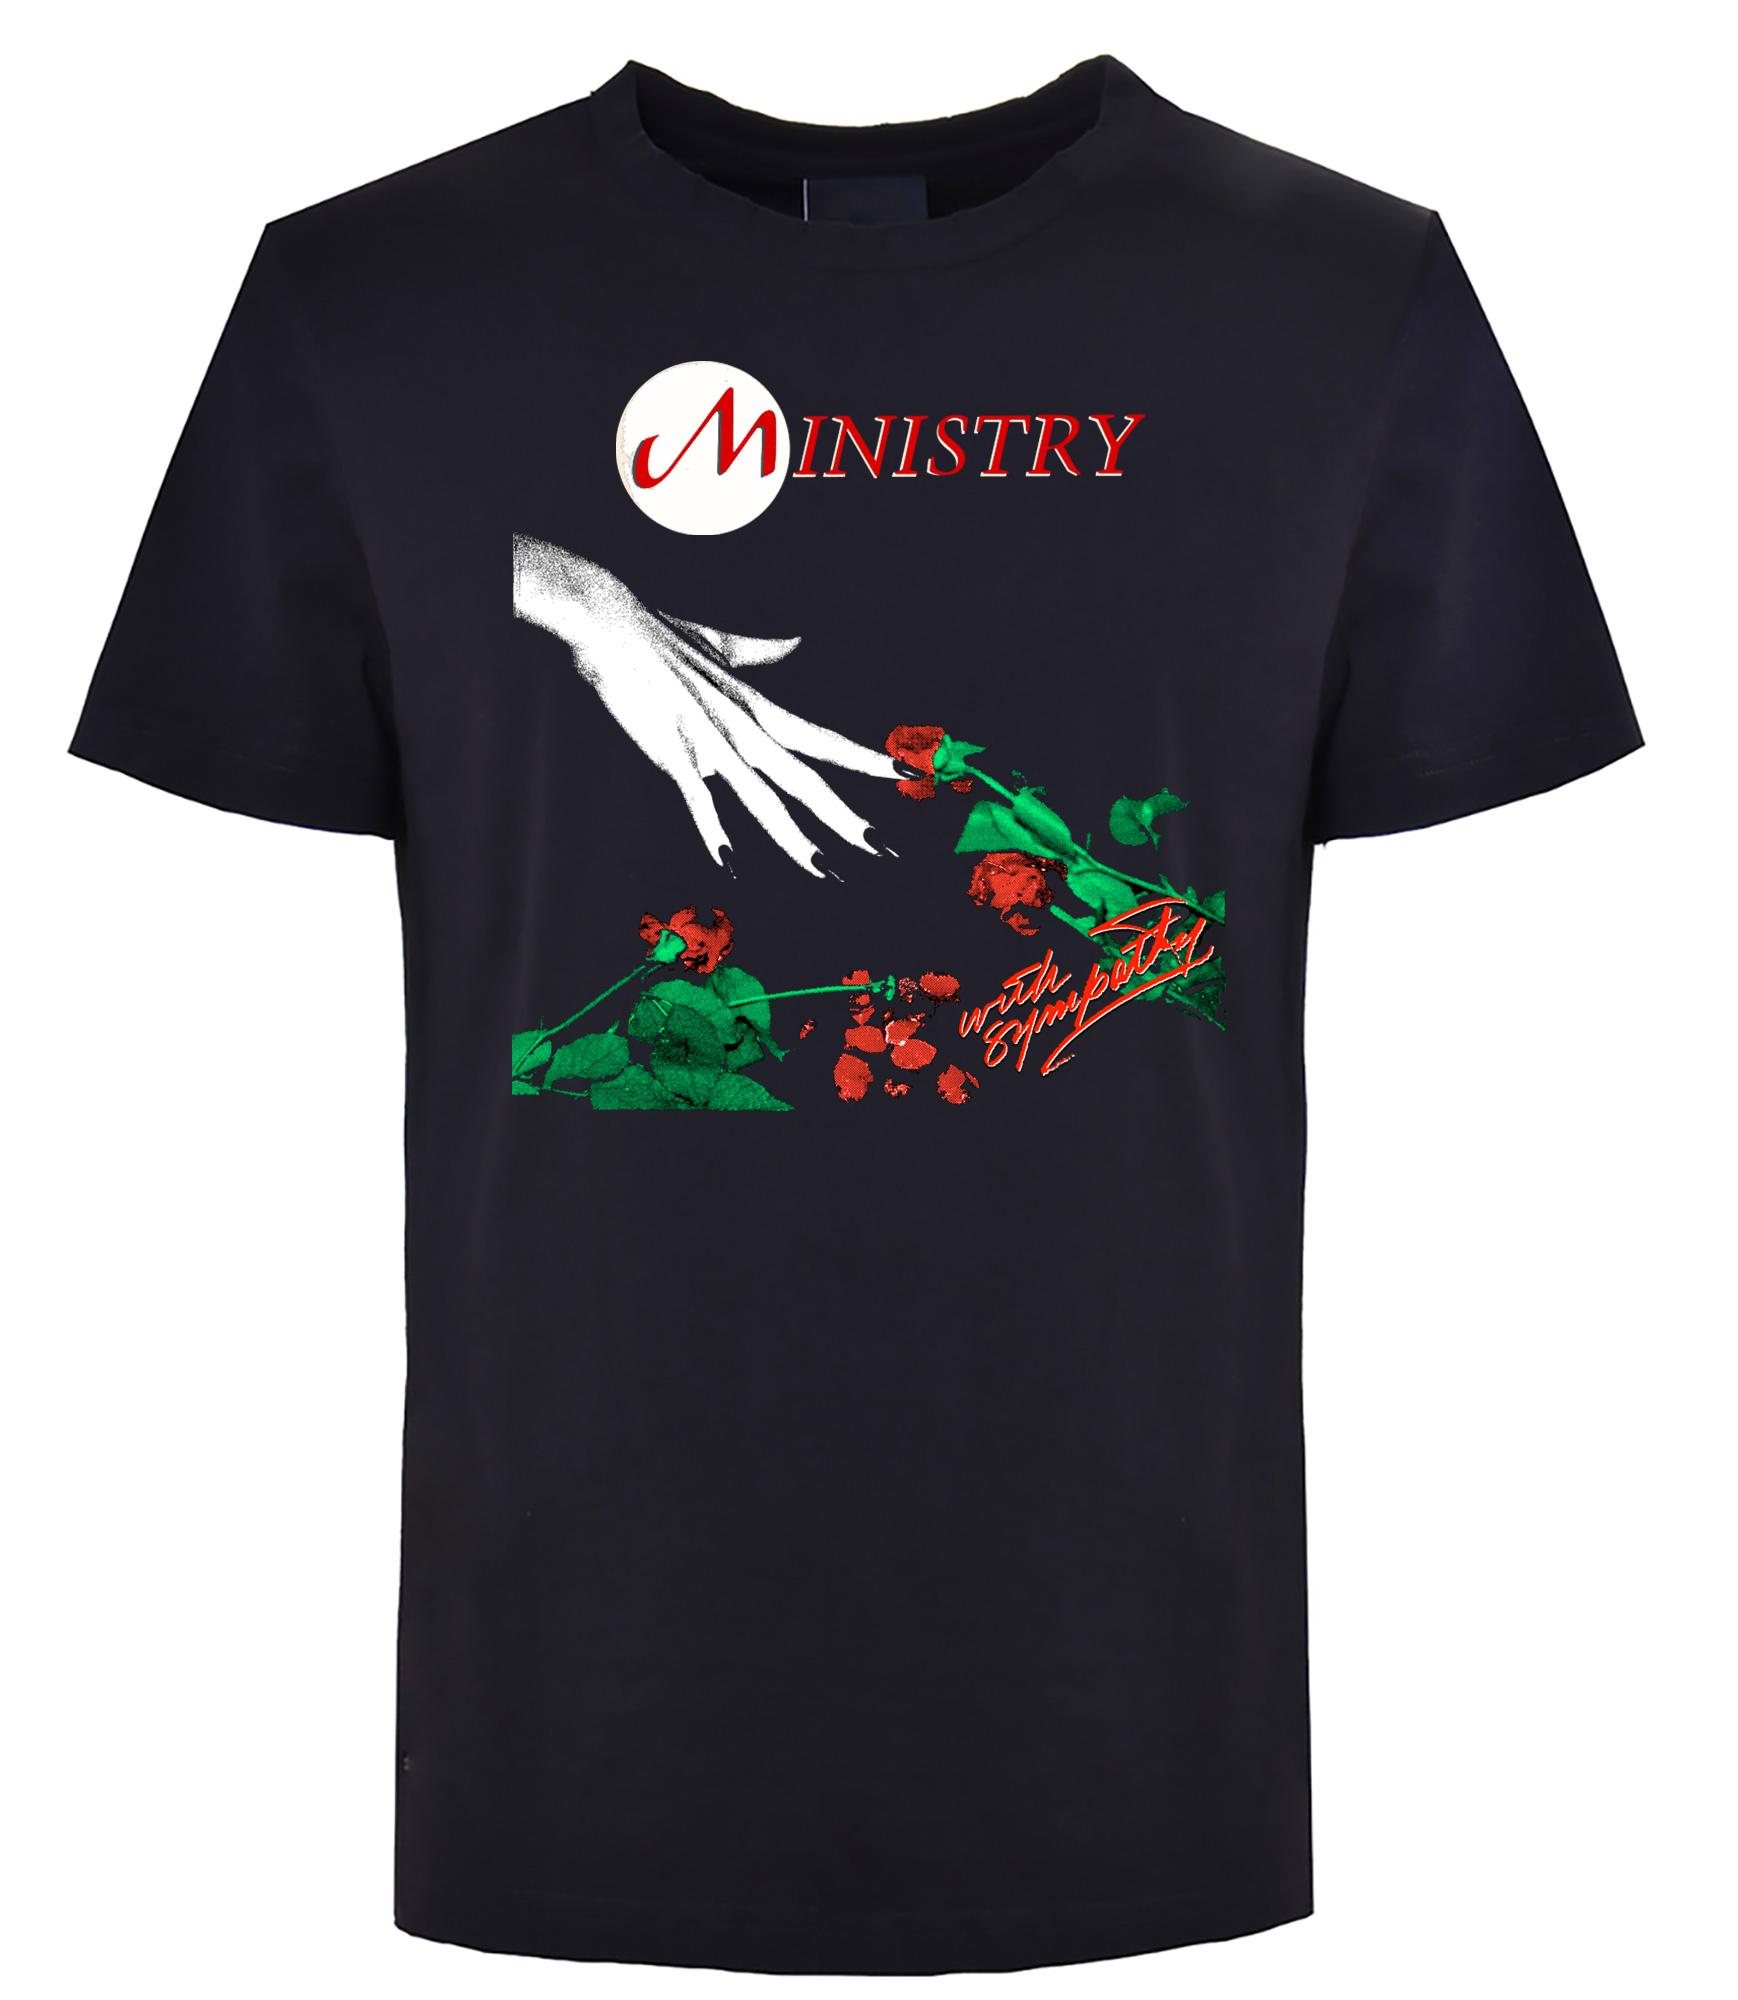 Ministry-shirt.jpg